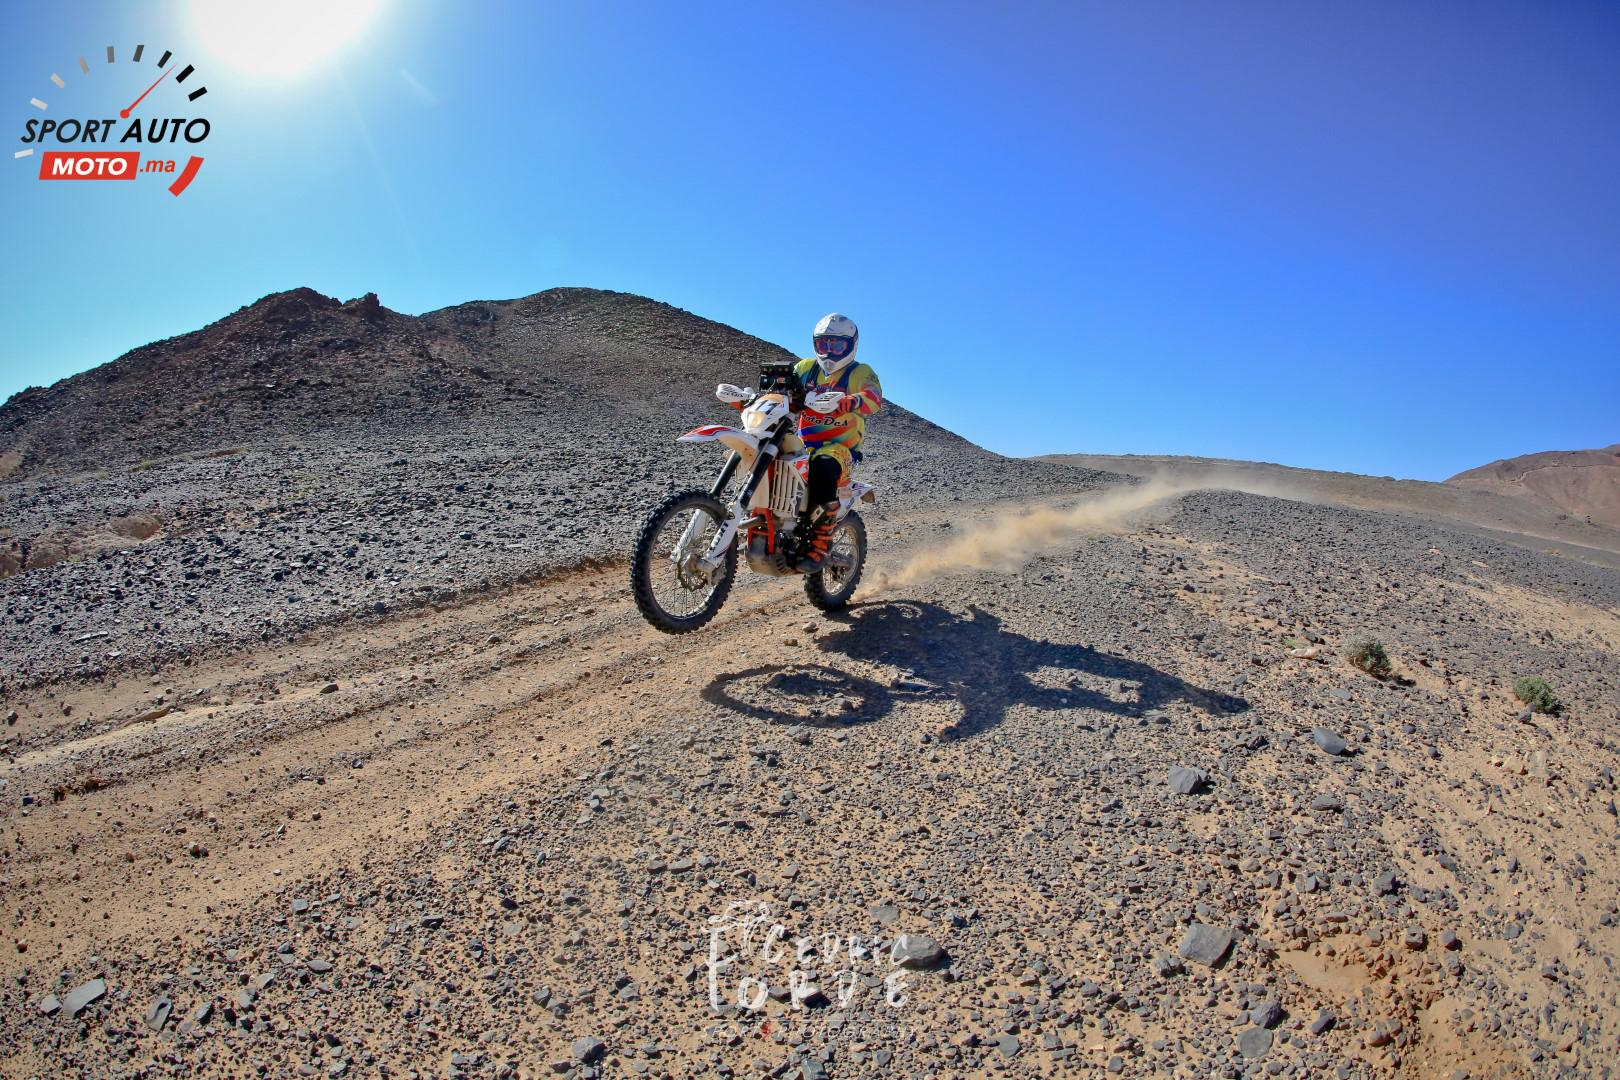 hearts-of-morocco-2018-zapletal-et-pedrero-remporte-le-rallye-899-5.jpg